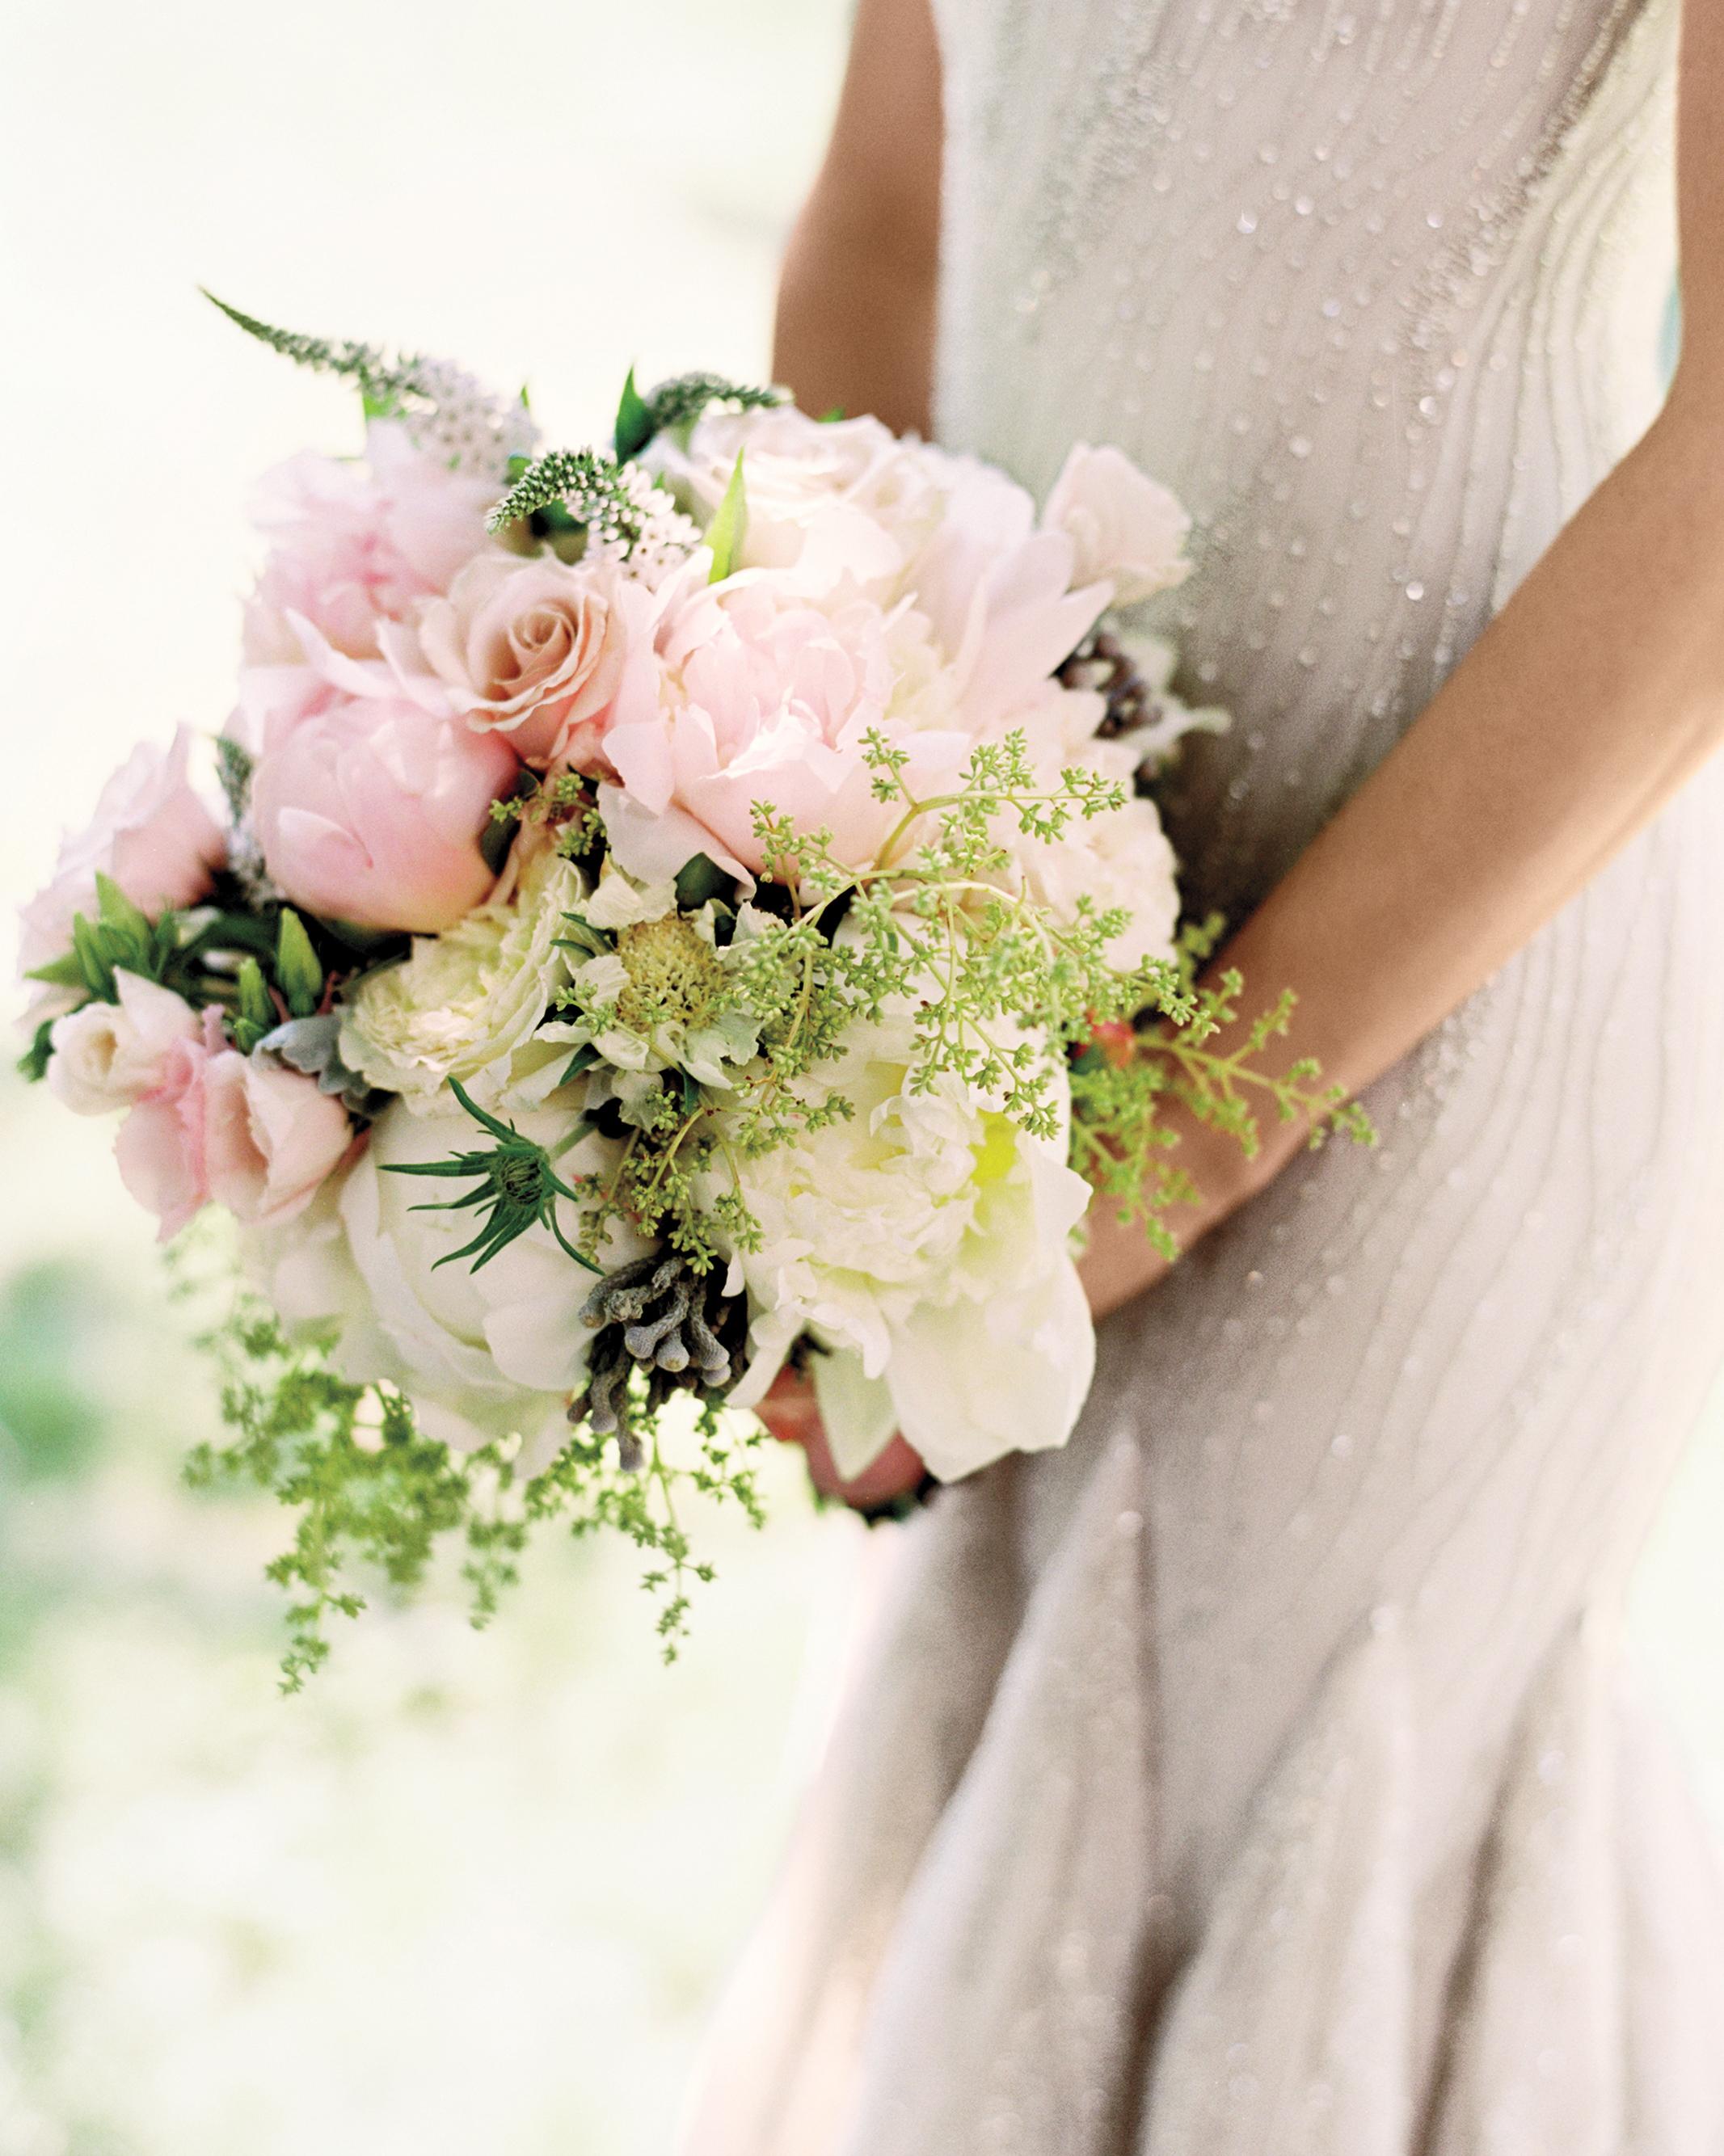 tiler-robbie-bridal-bouquet-009-d111357.jpg